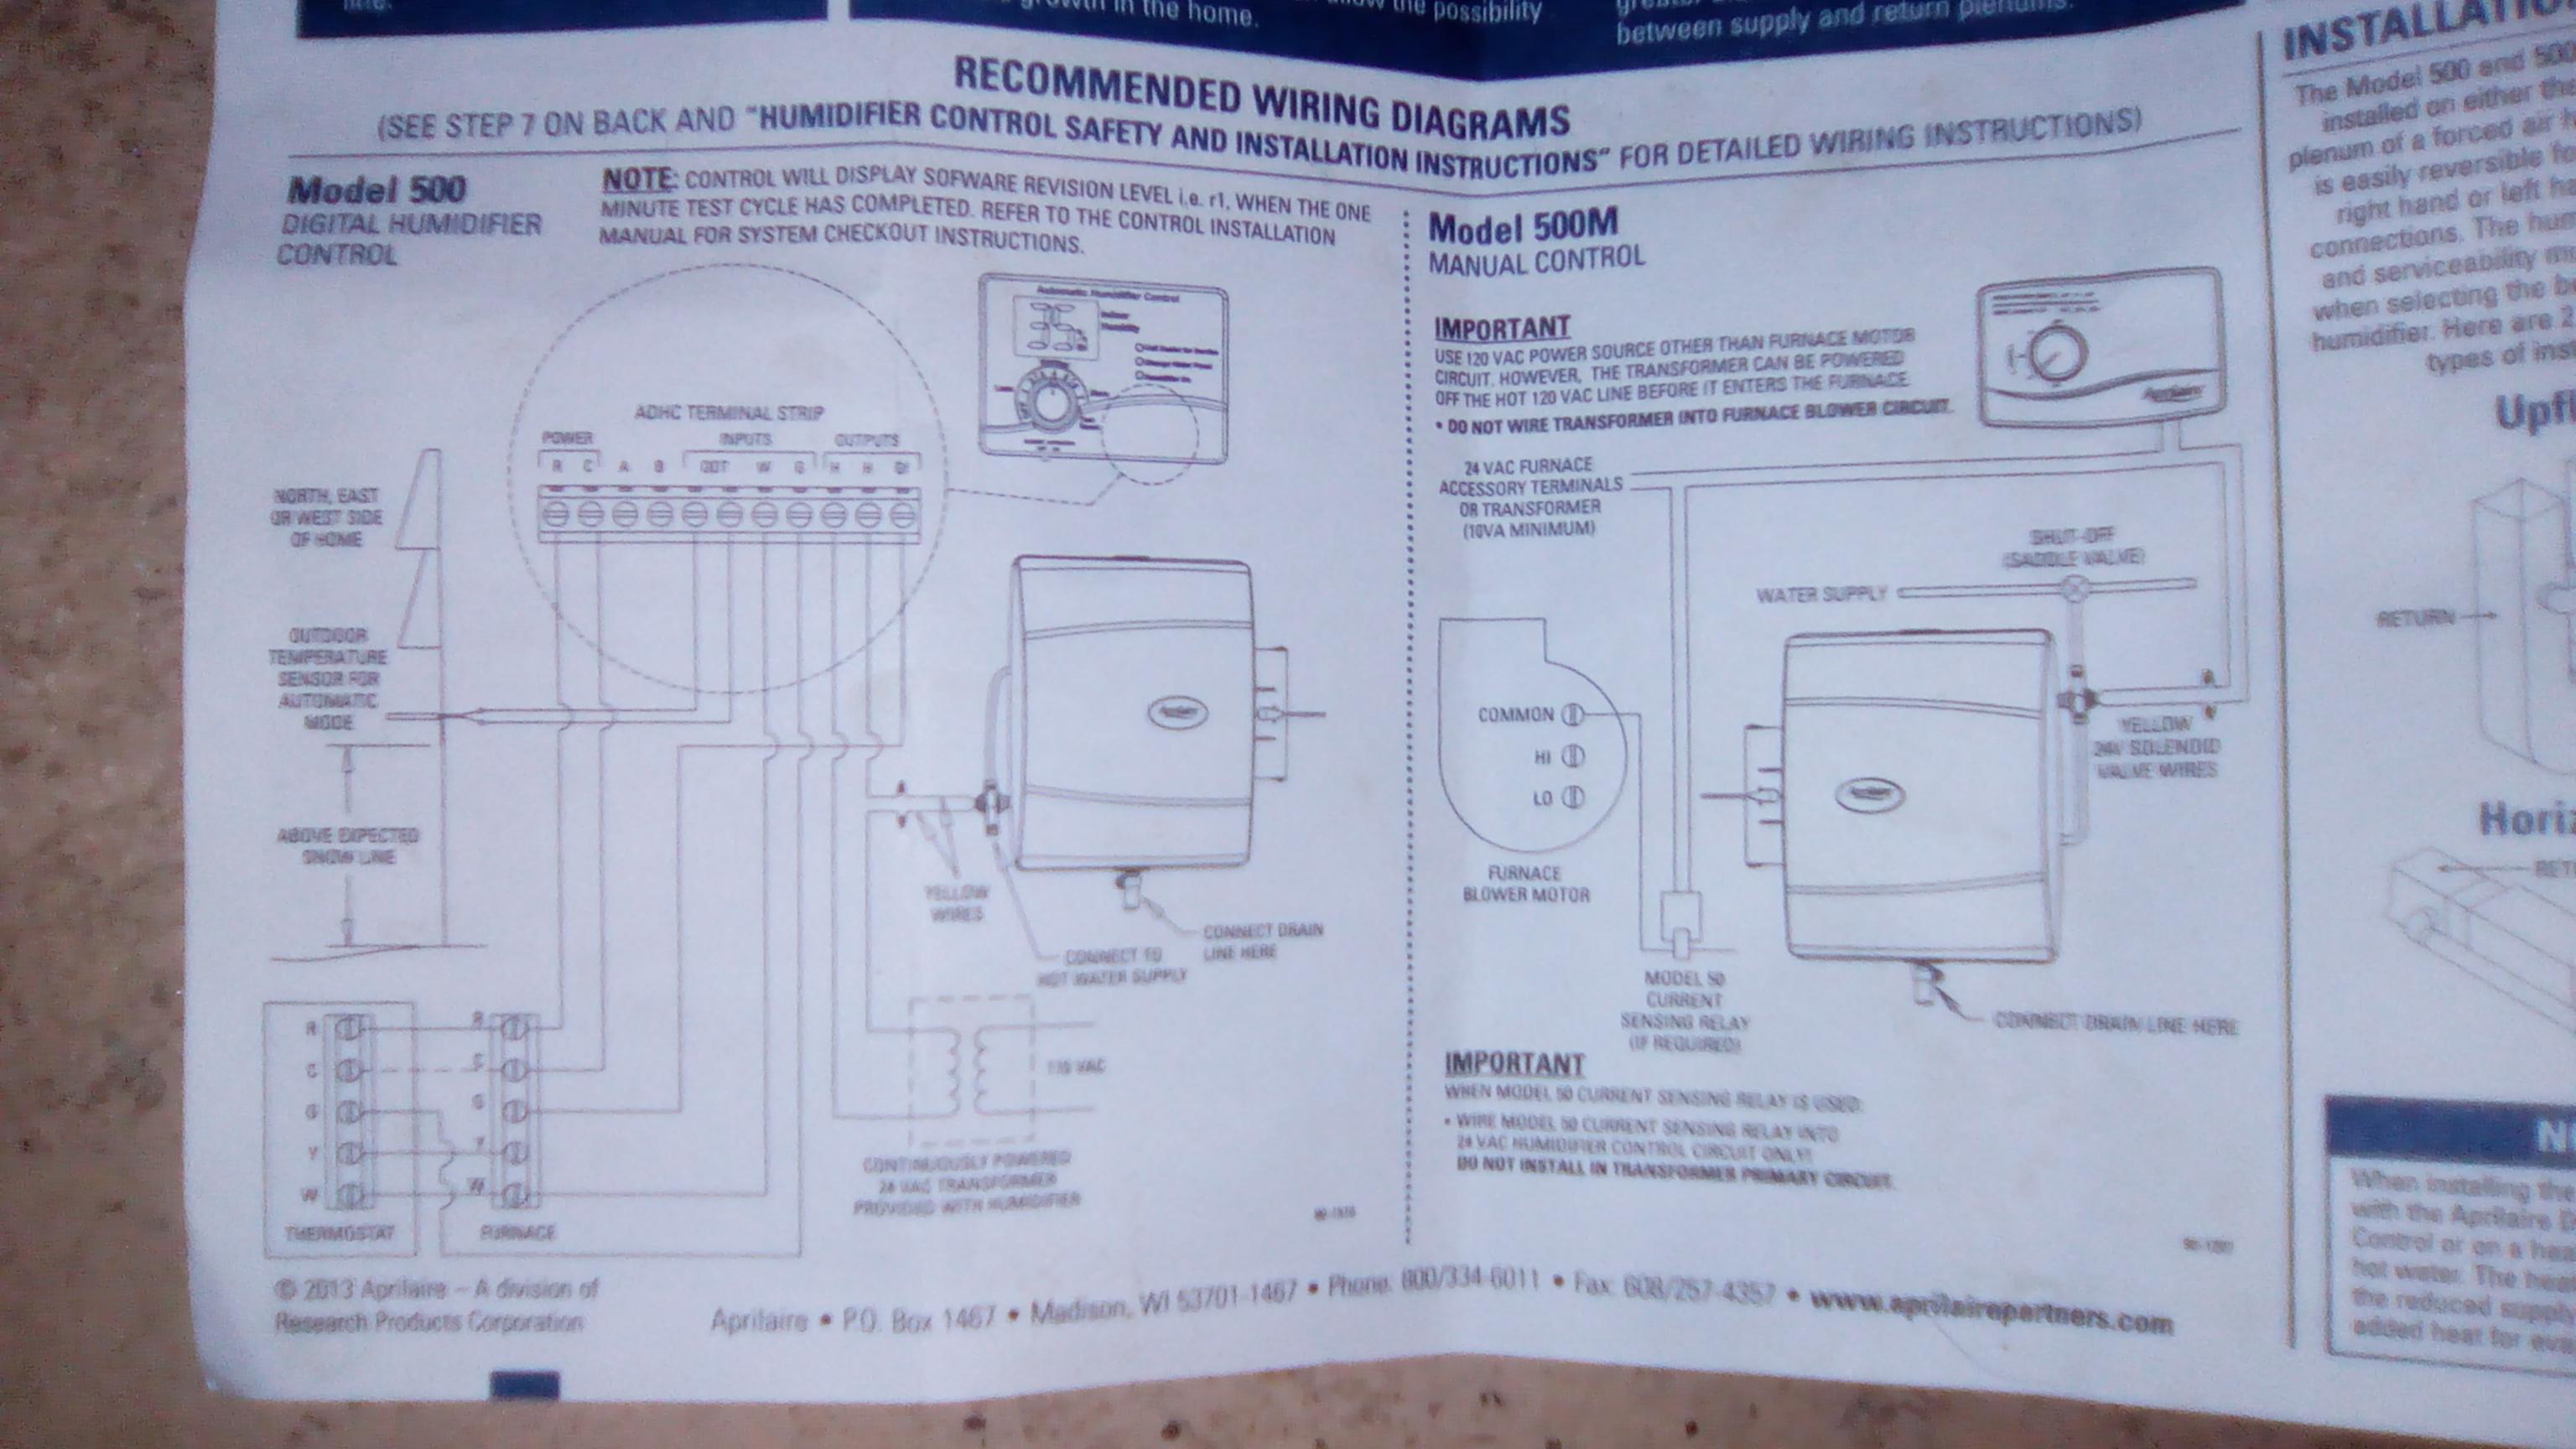 aprilaire 600 humidistat wiring diagram wiring diagram  Sgds8?resize=665%2C374&ssl=1 aprilaire 600 humidistat wiring diagram wiring  diagram